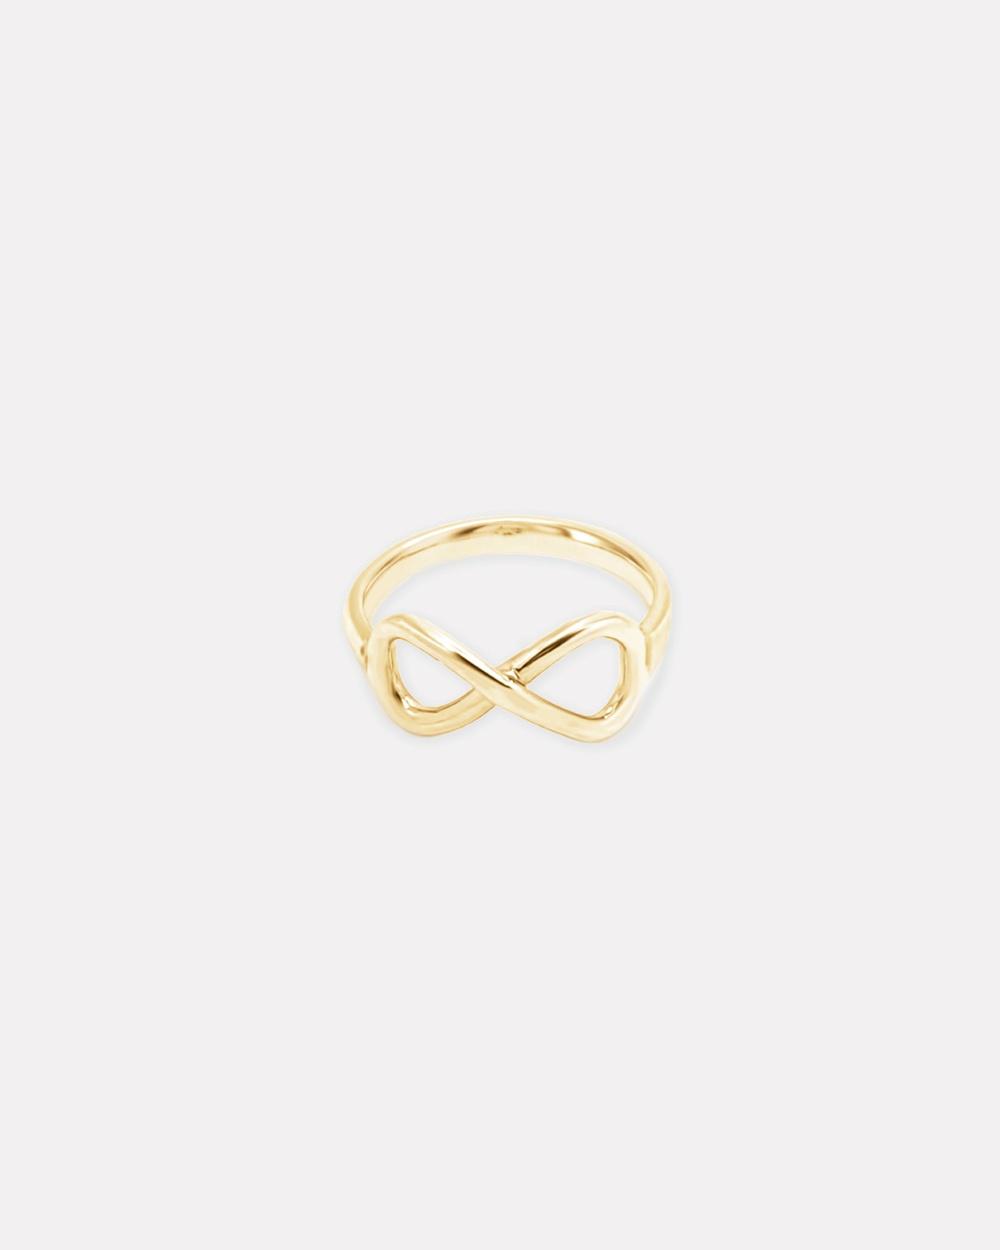 Ichu Infinity Ring, Gold Jewellery Gold